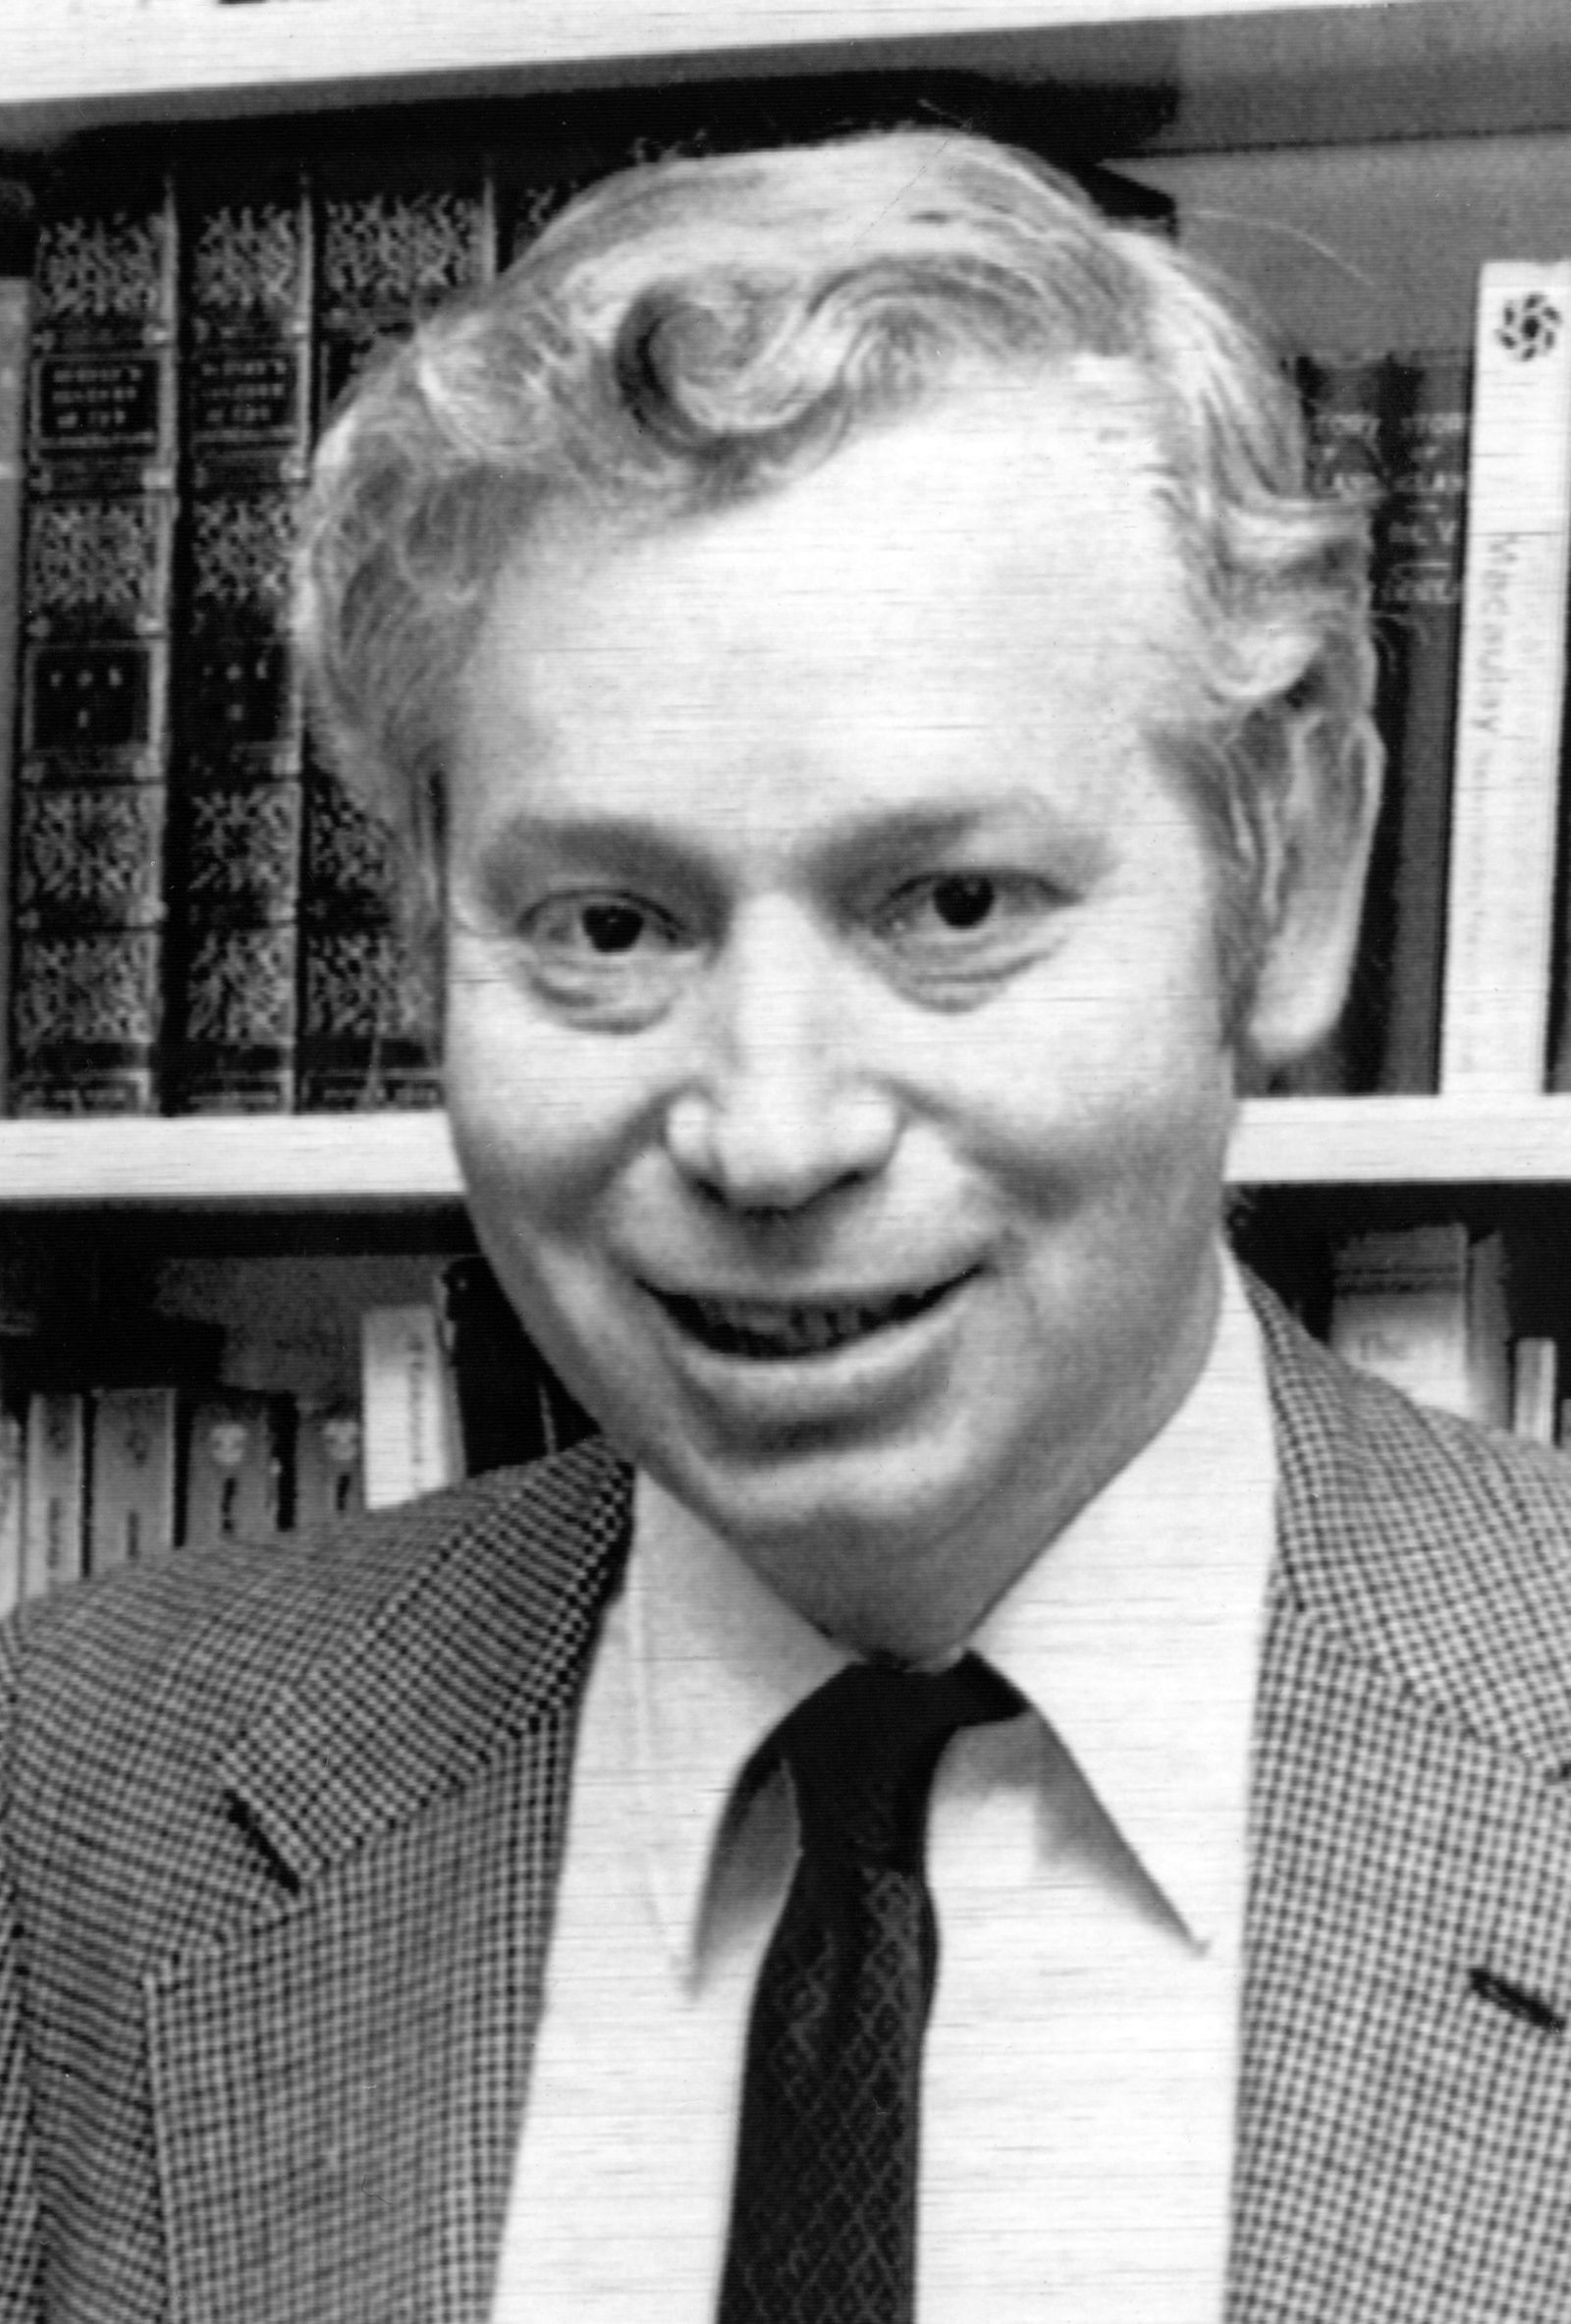 Prof. Steven Weinberg